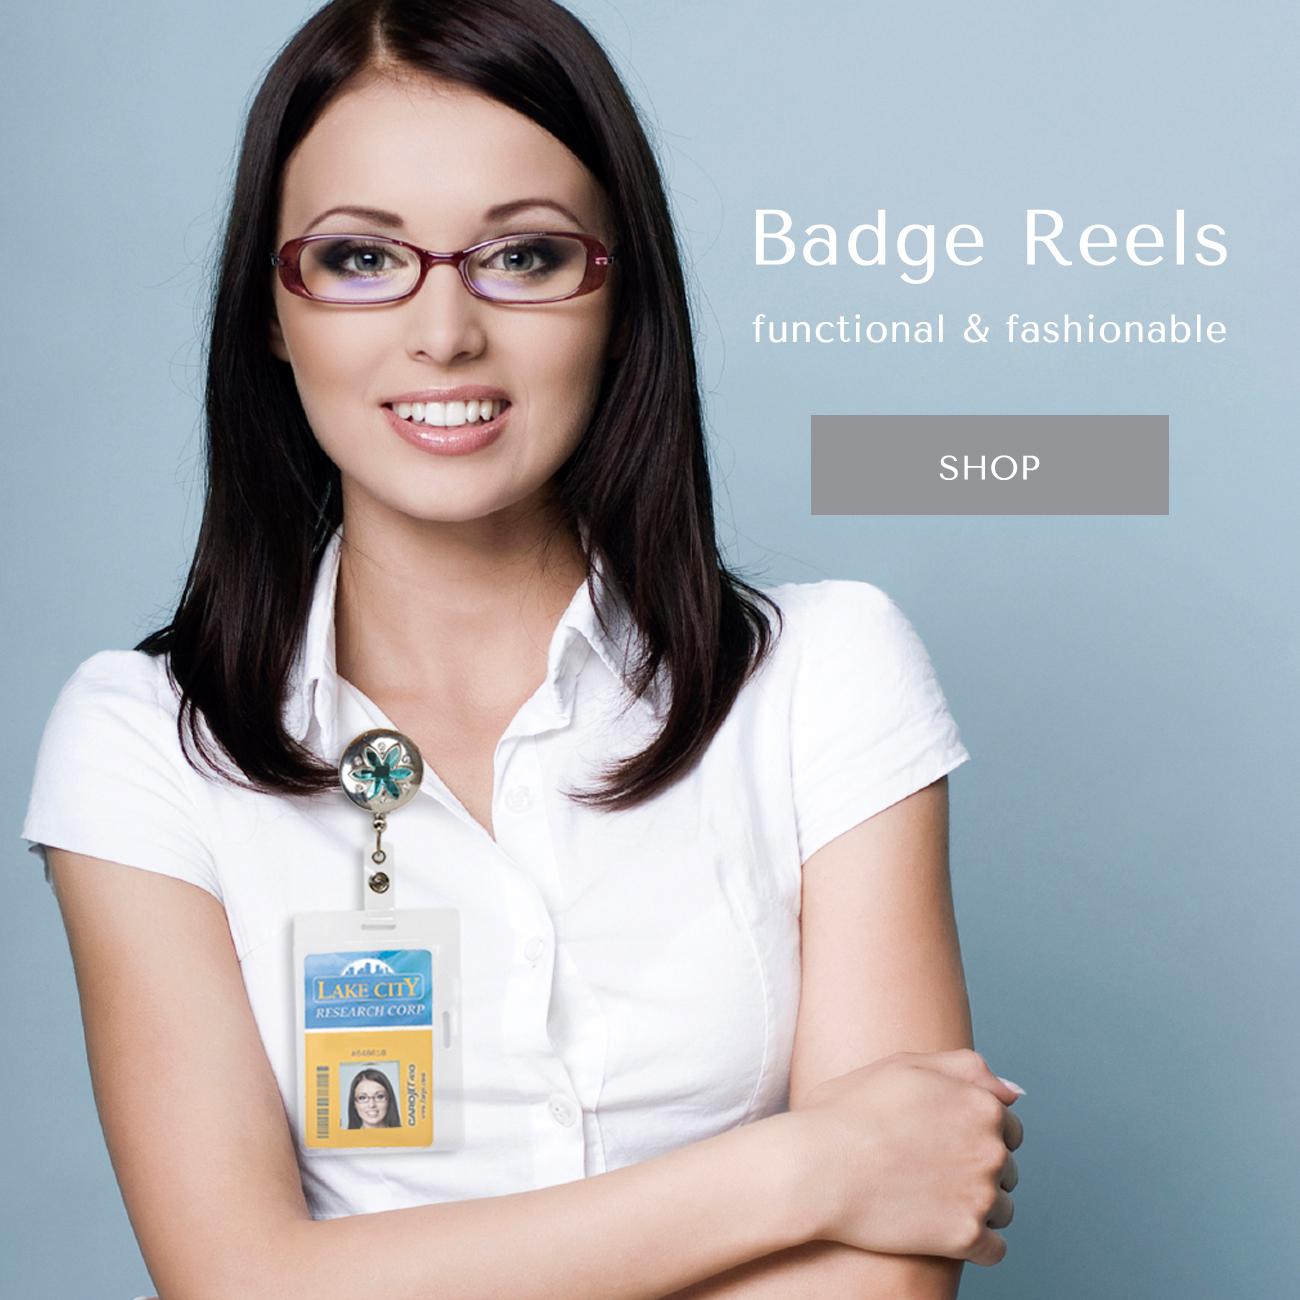 Badge Reels: functional & fashionable